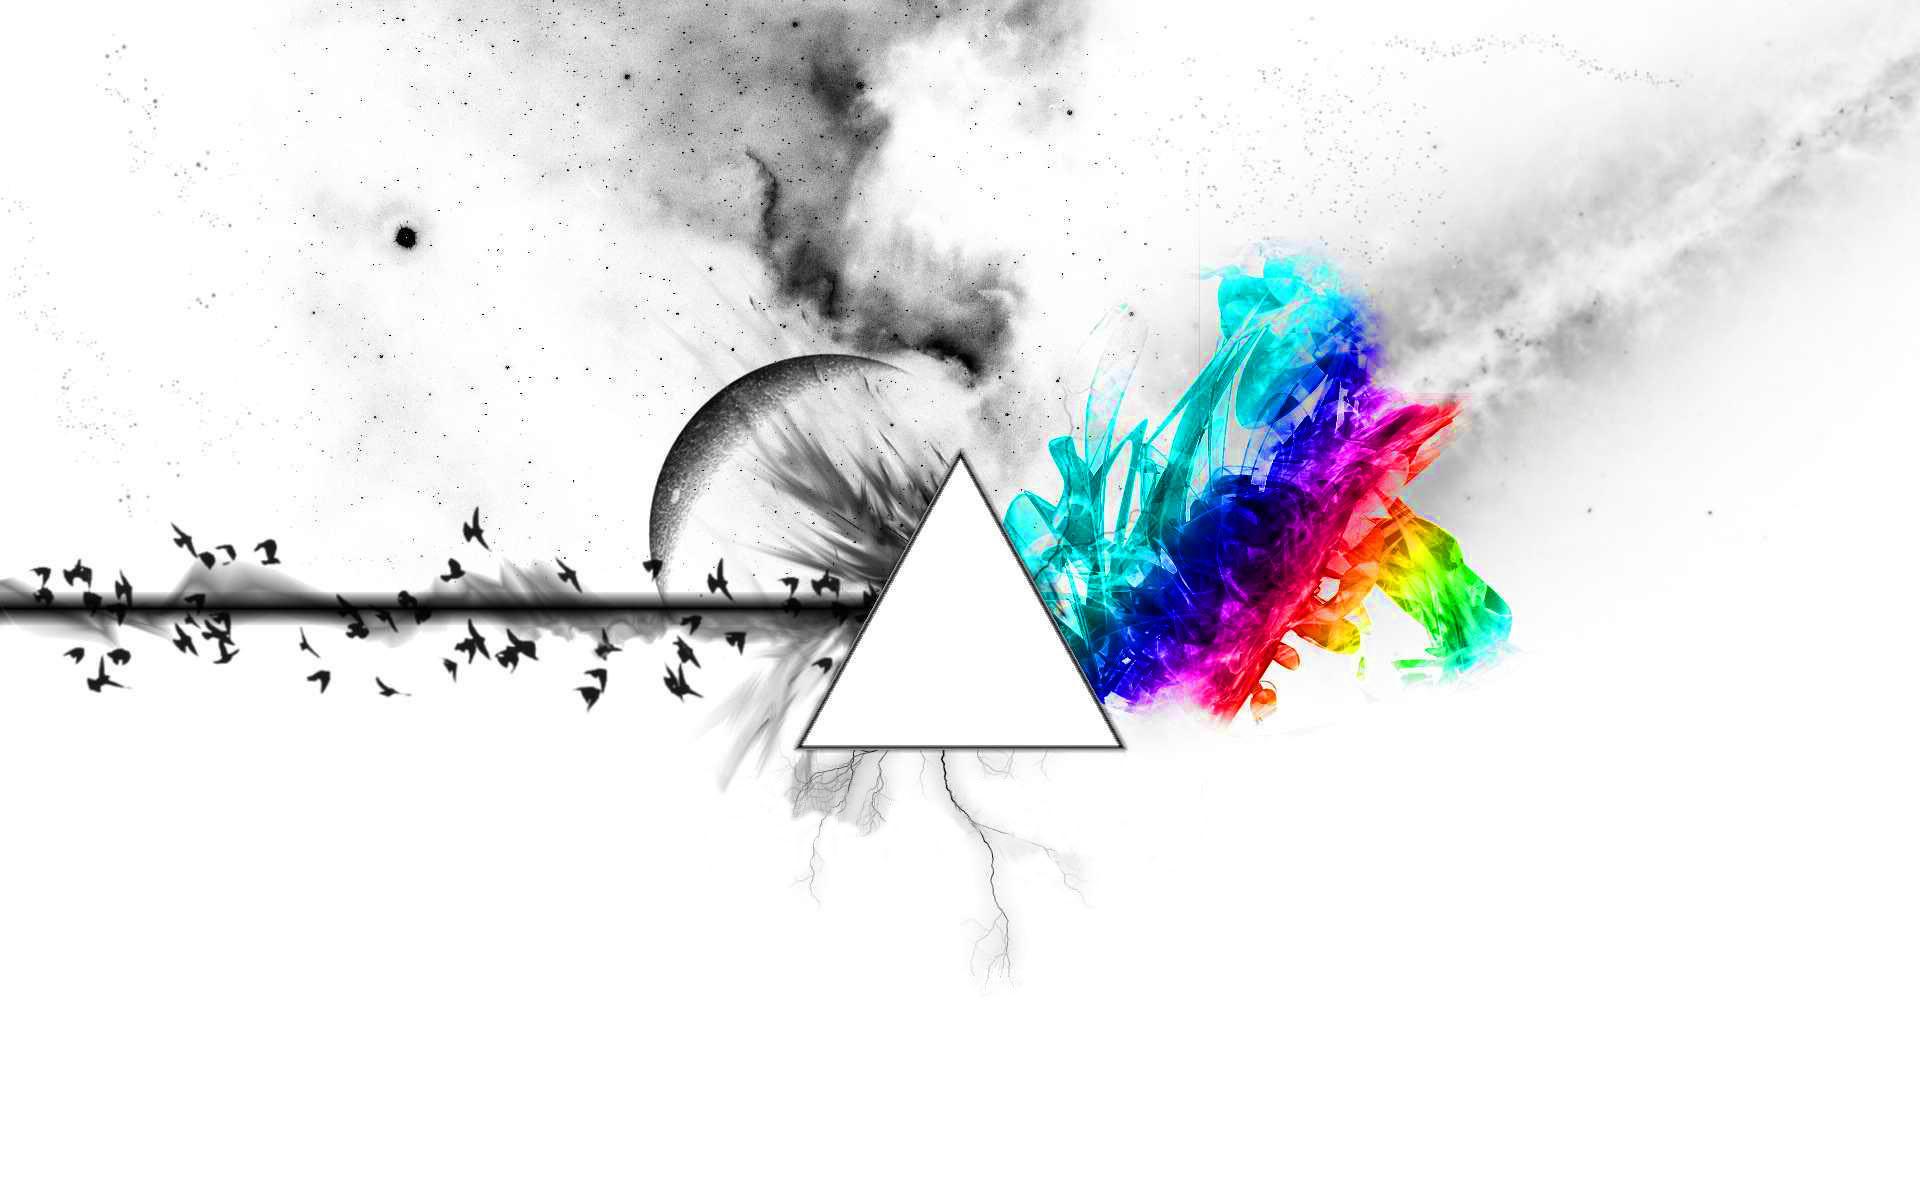 Cool Pink Floyd Wallpaper 23800